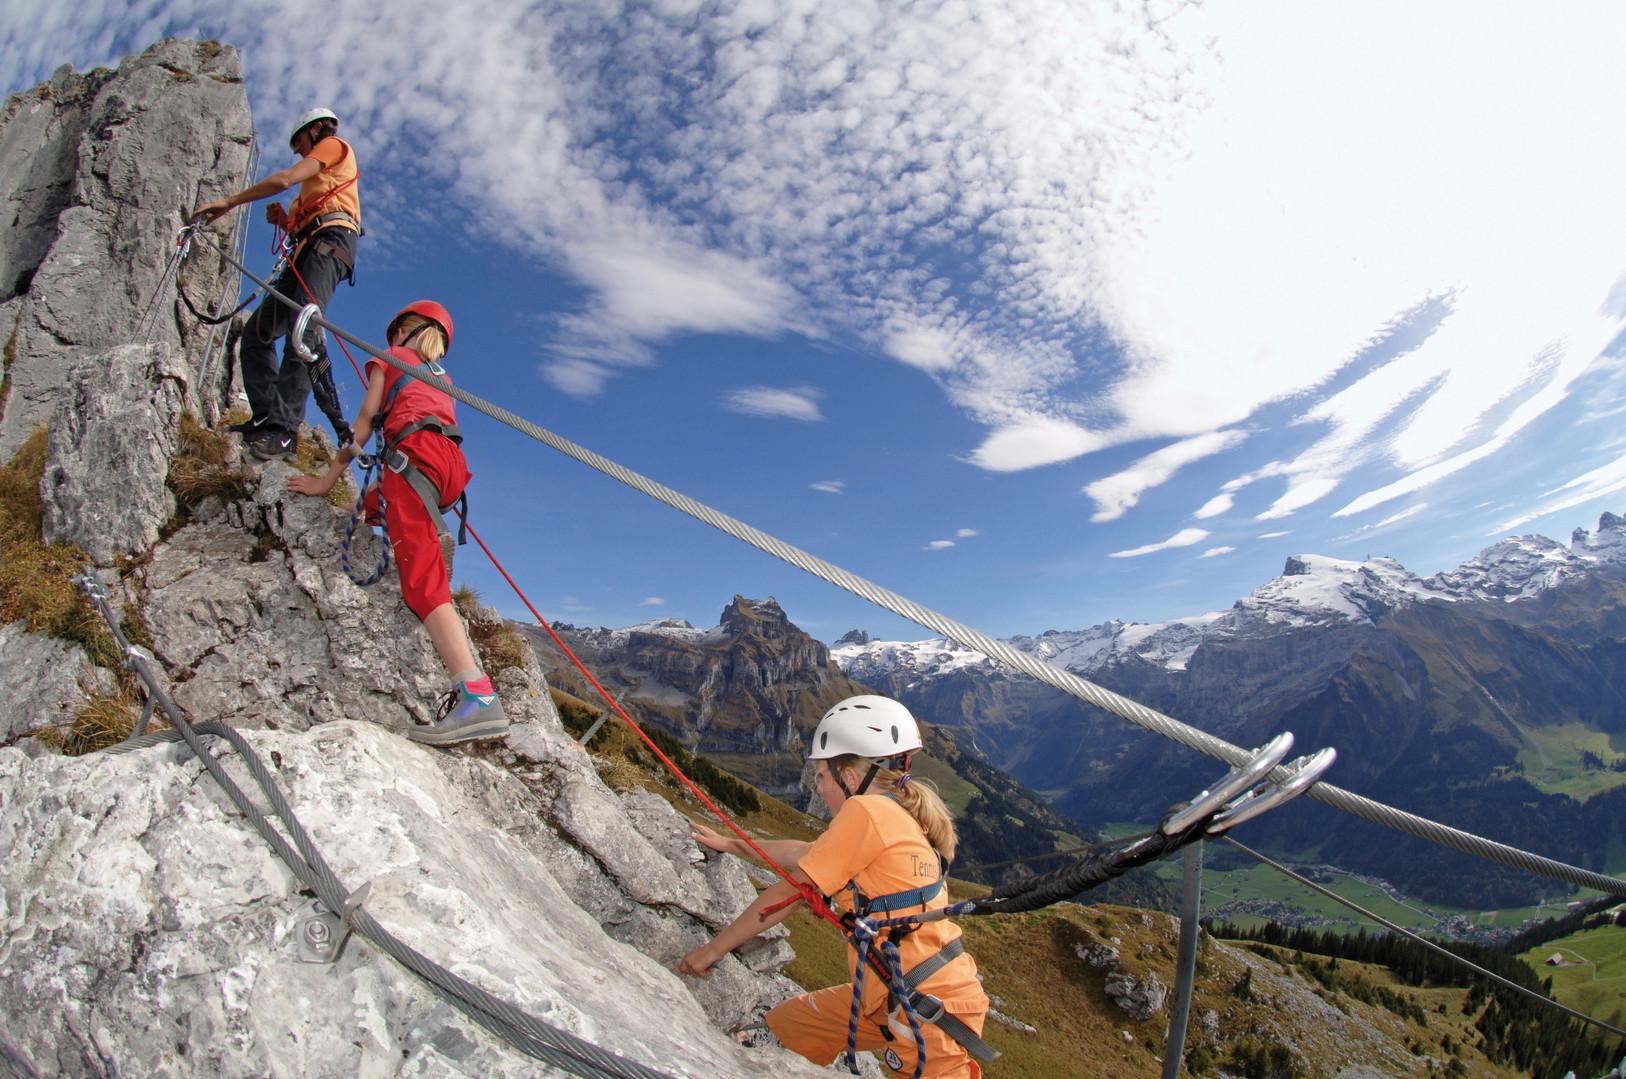 brunnstoeckli-klettersteig-1.jpg